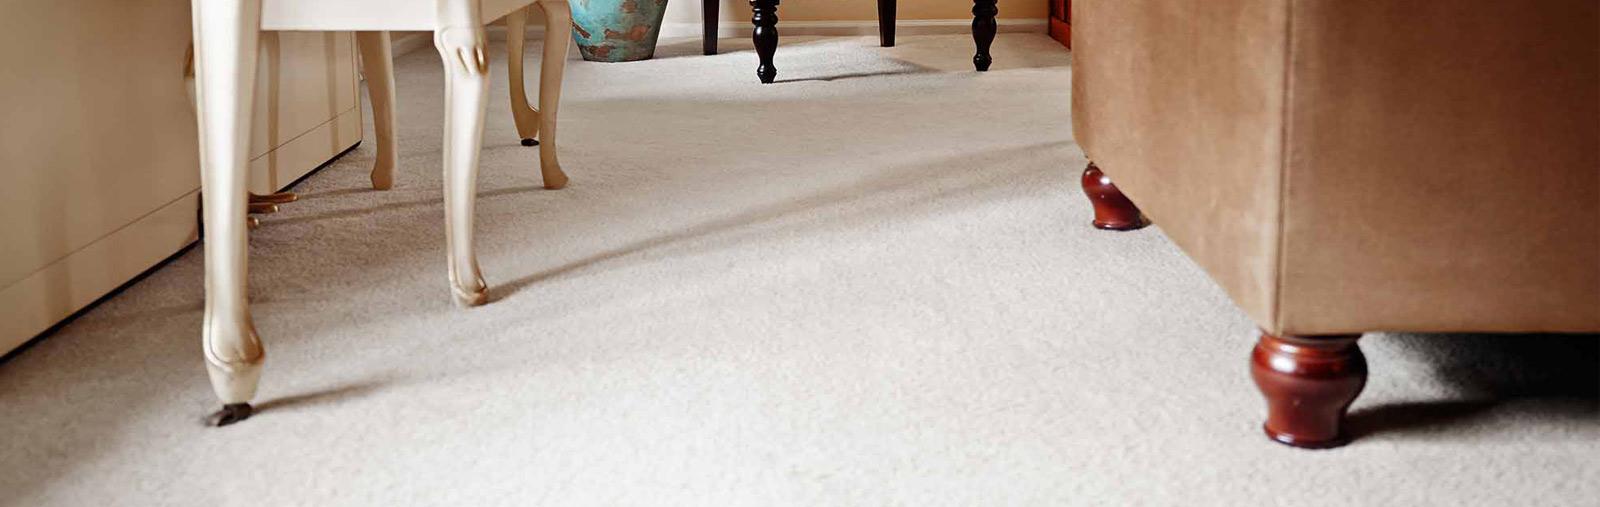 Carpet-Cleaning-Slide-3